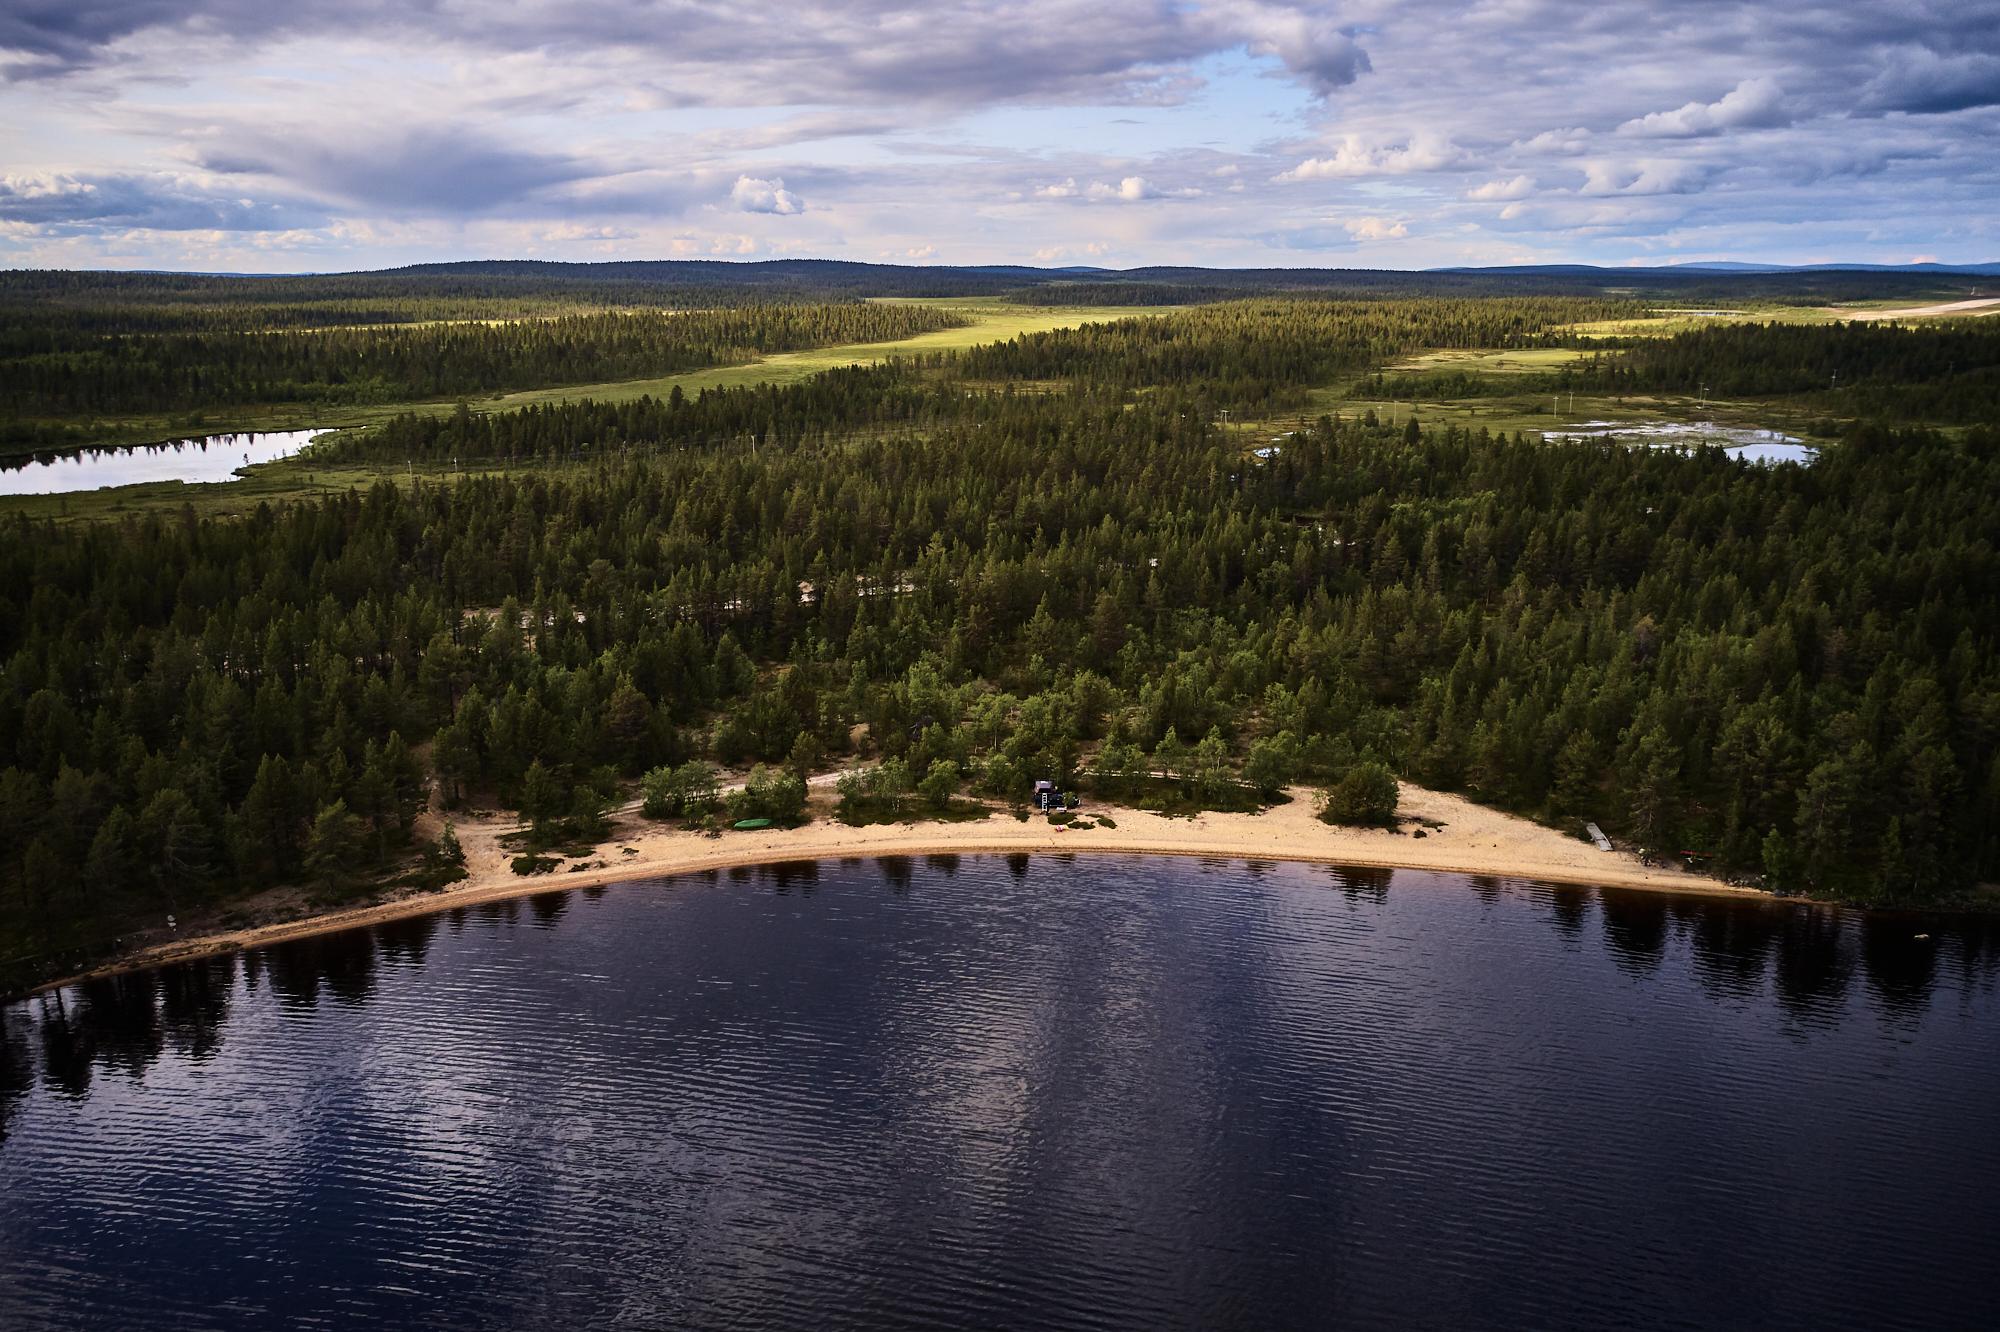 20190710-Zweden-S19-DJI_0462.jpg